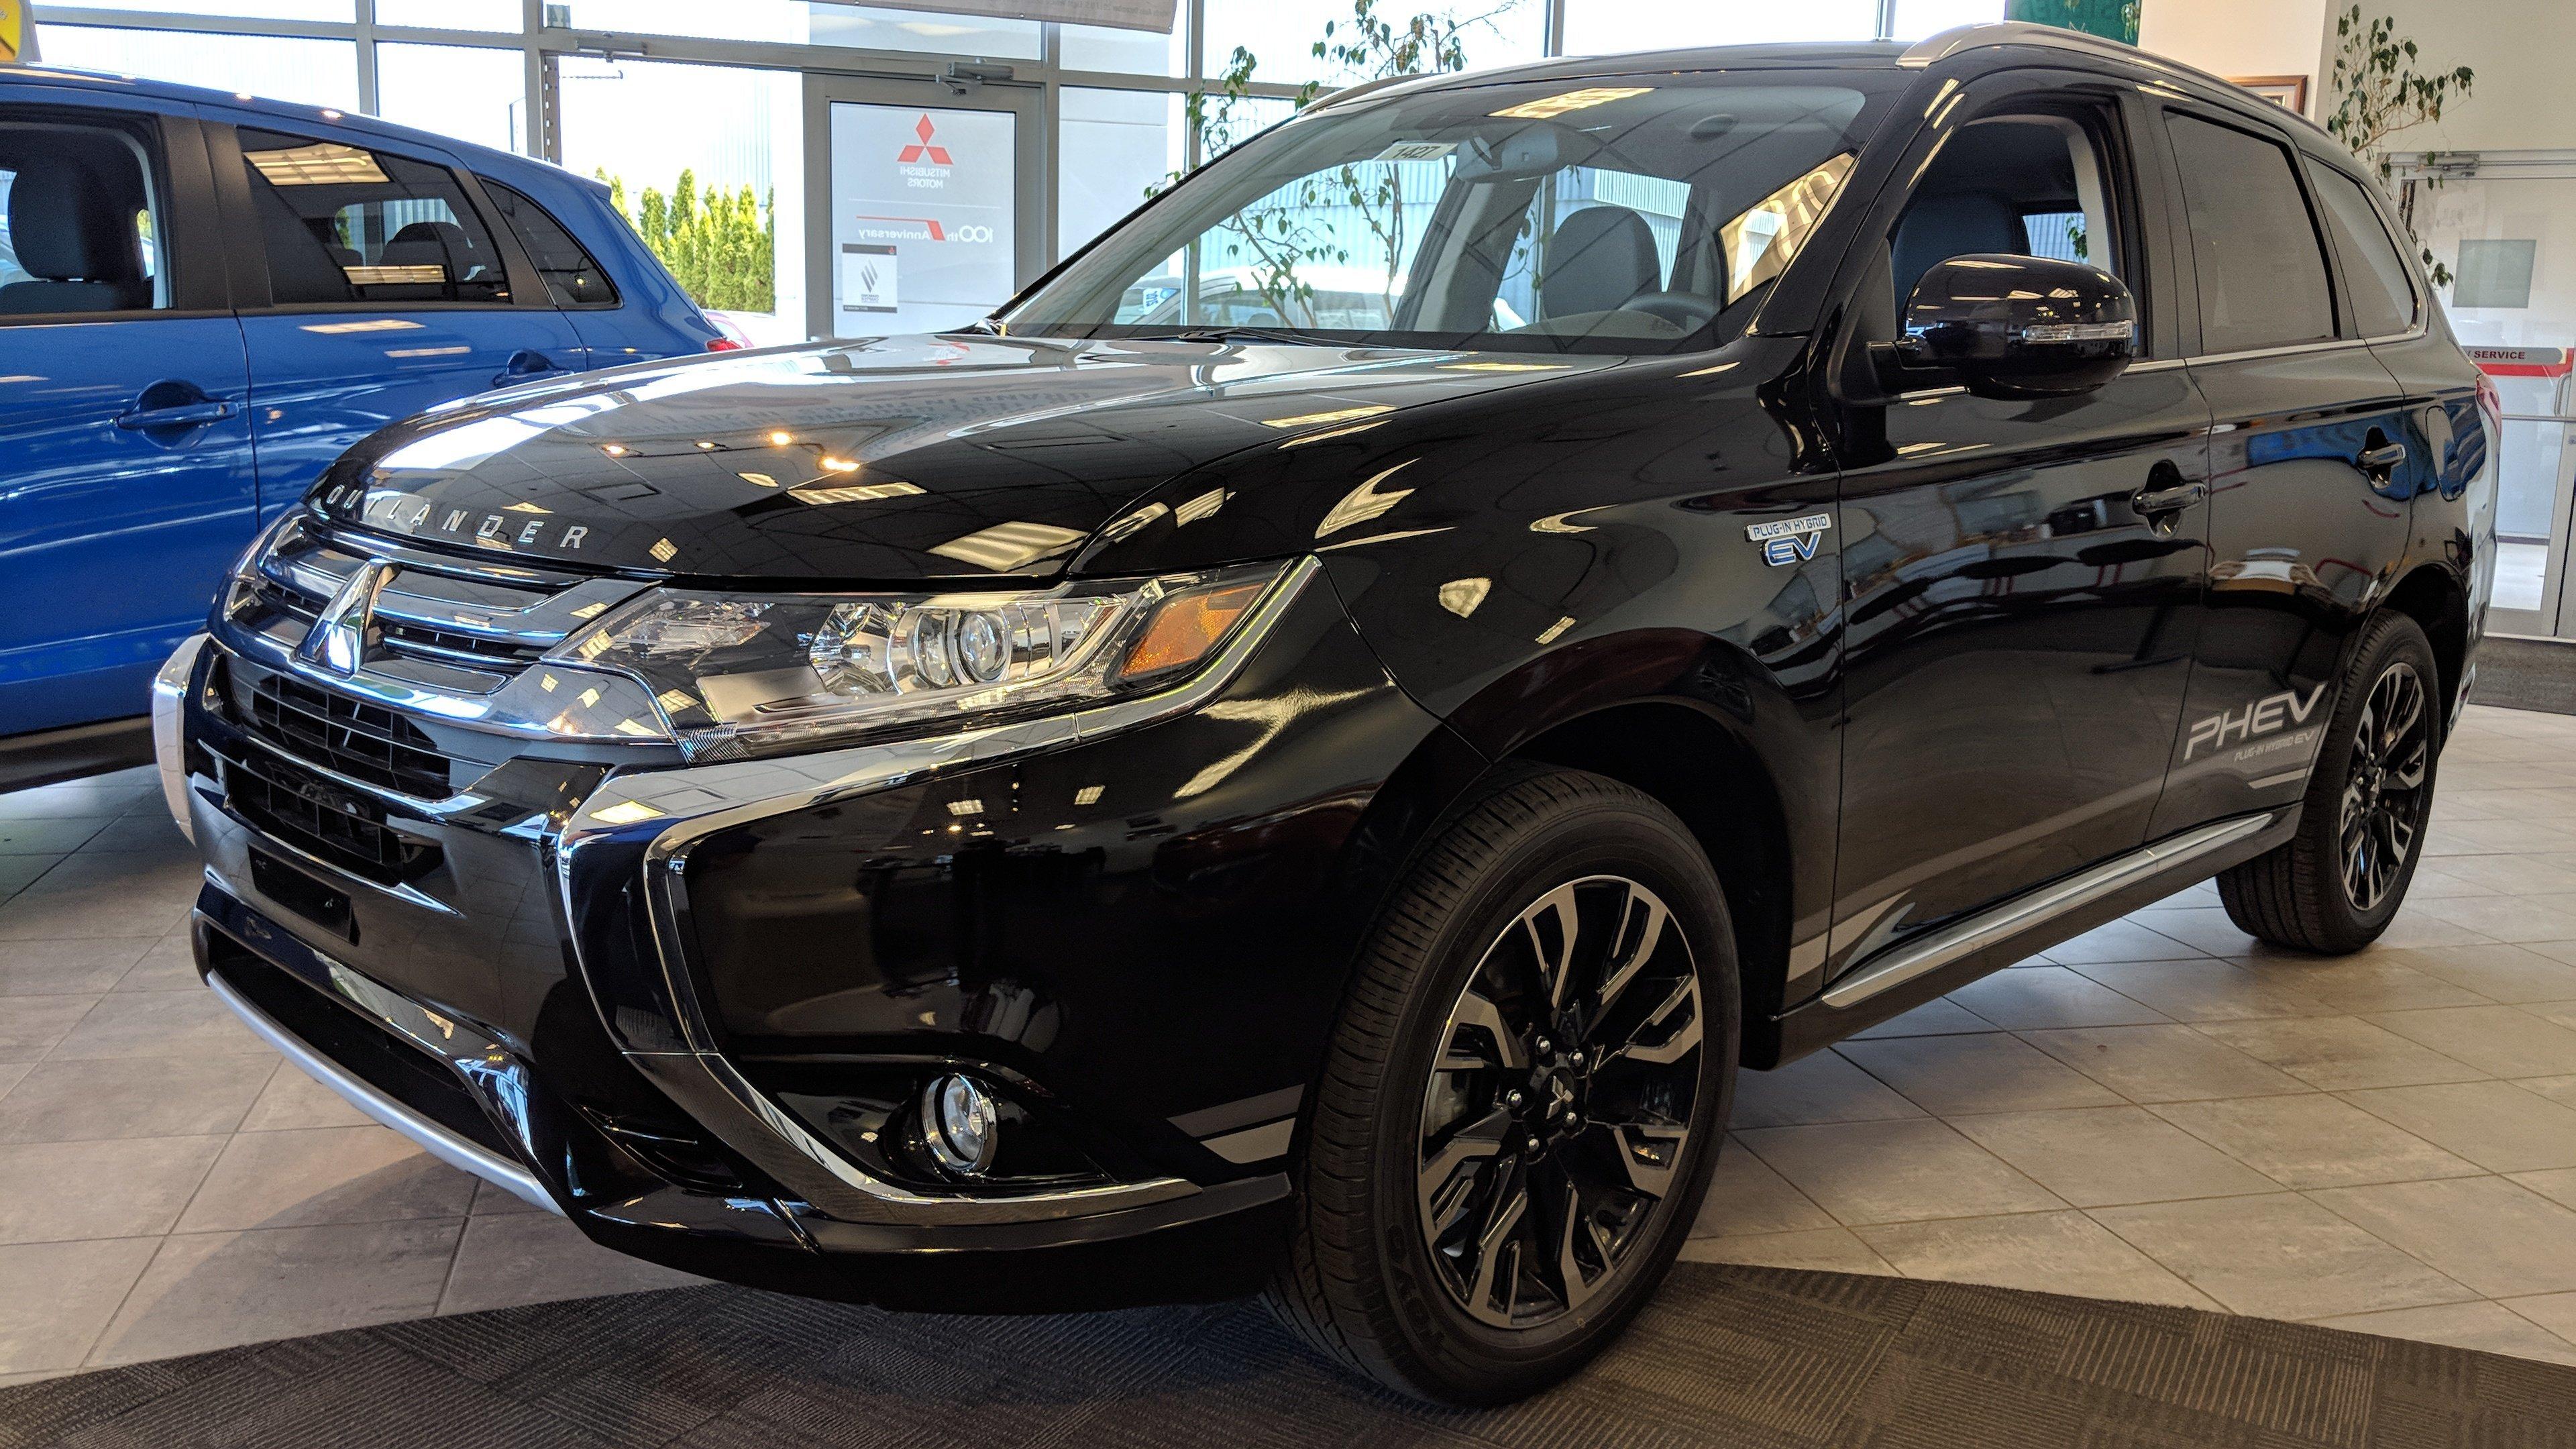 Mitsubishi Lease Deals & Prices Cicero NY